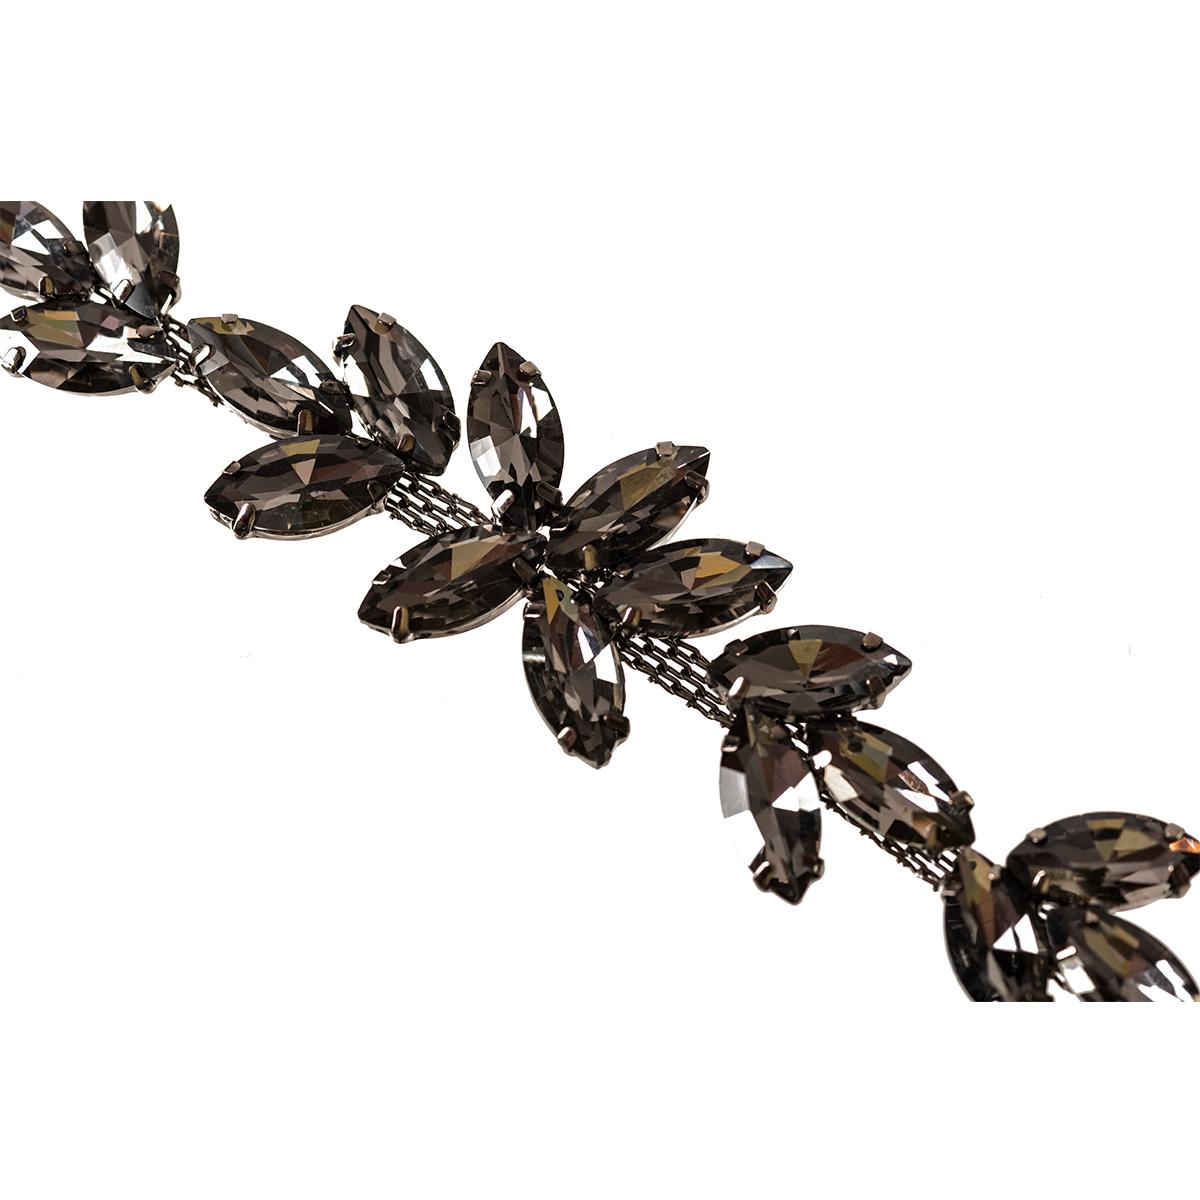 Rhinestone-Diamante-Motif-Applique-Sew-on-Crystal-Patch-for-Wedding-Bridal-Dress thumbnail 23